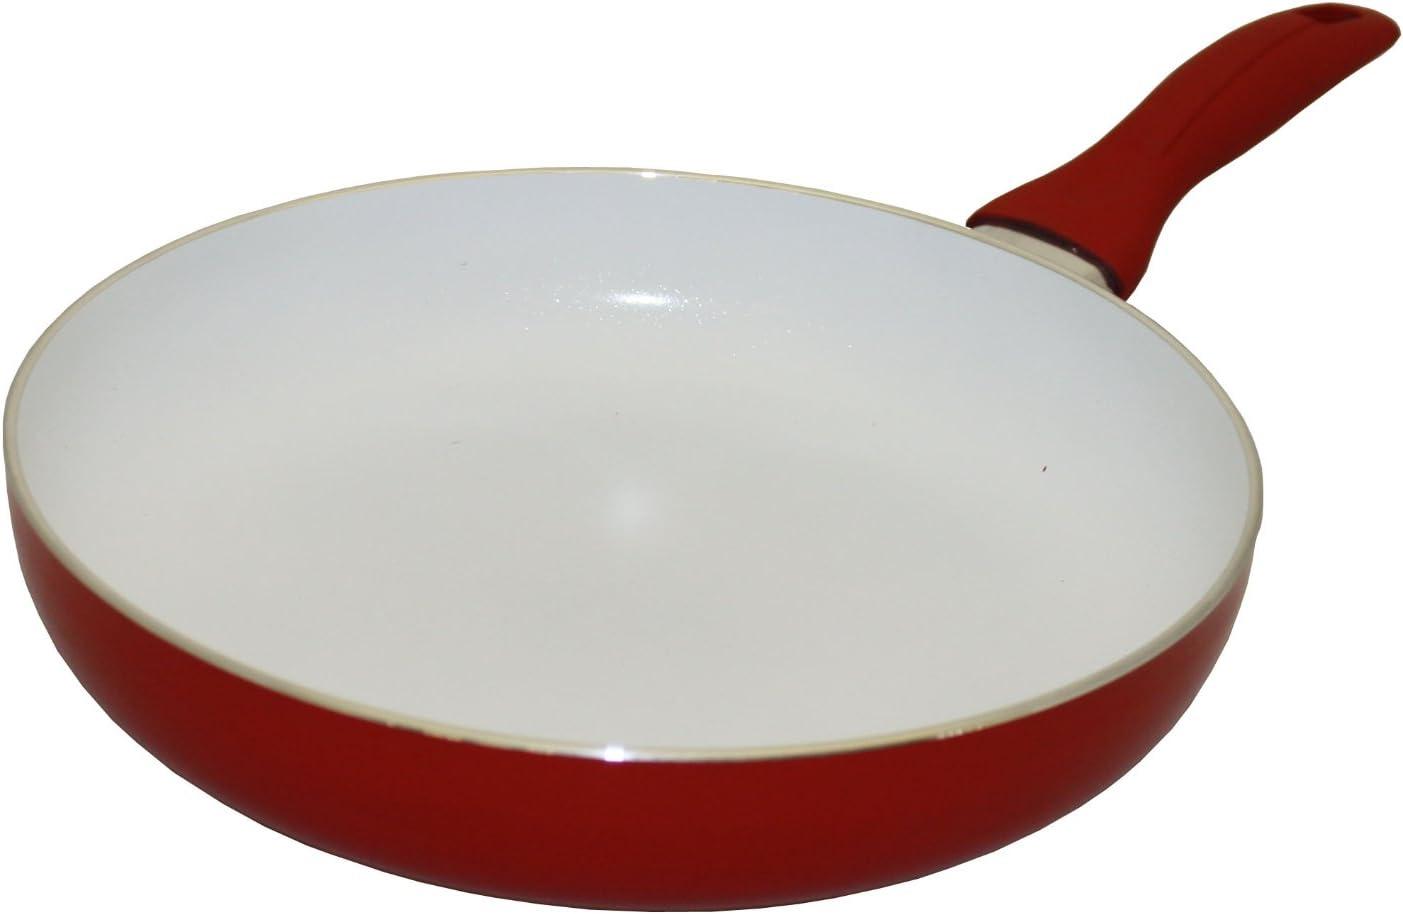 Amazon Com Concord Cookware Ceramic Coated Non Stick Fry Pan 12 Inch Red Sarten De Ceramica Kitchen Dining